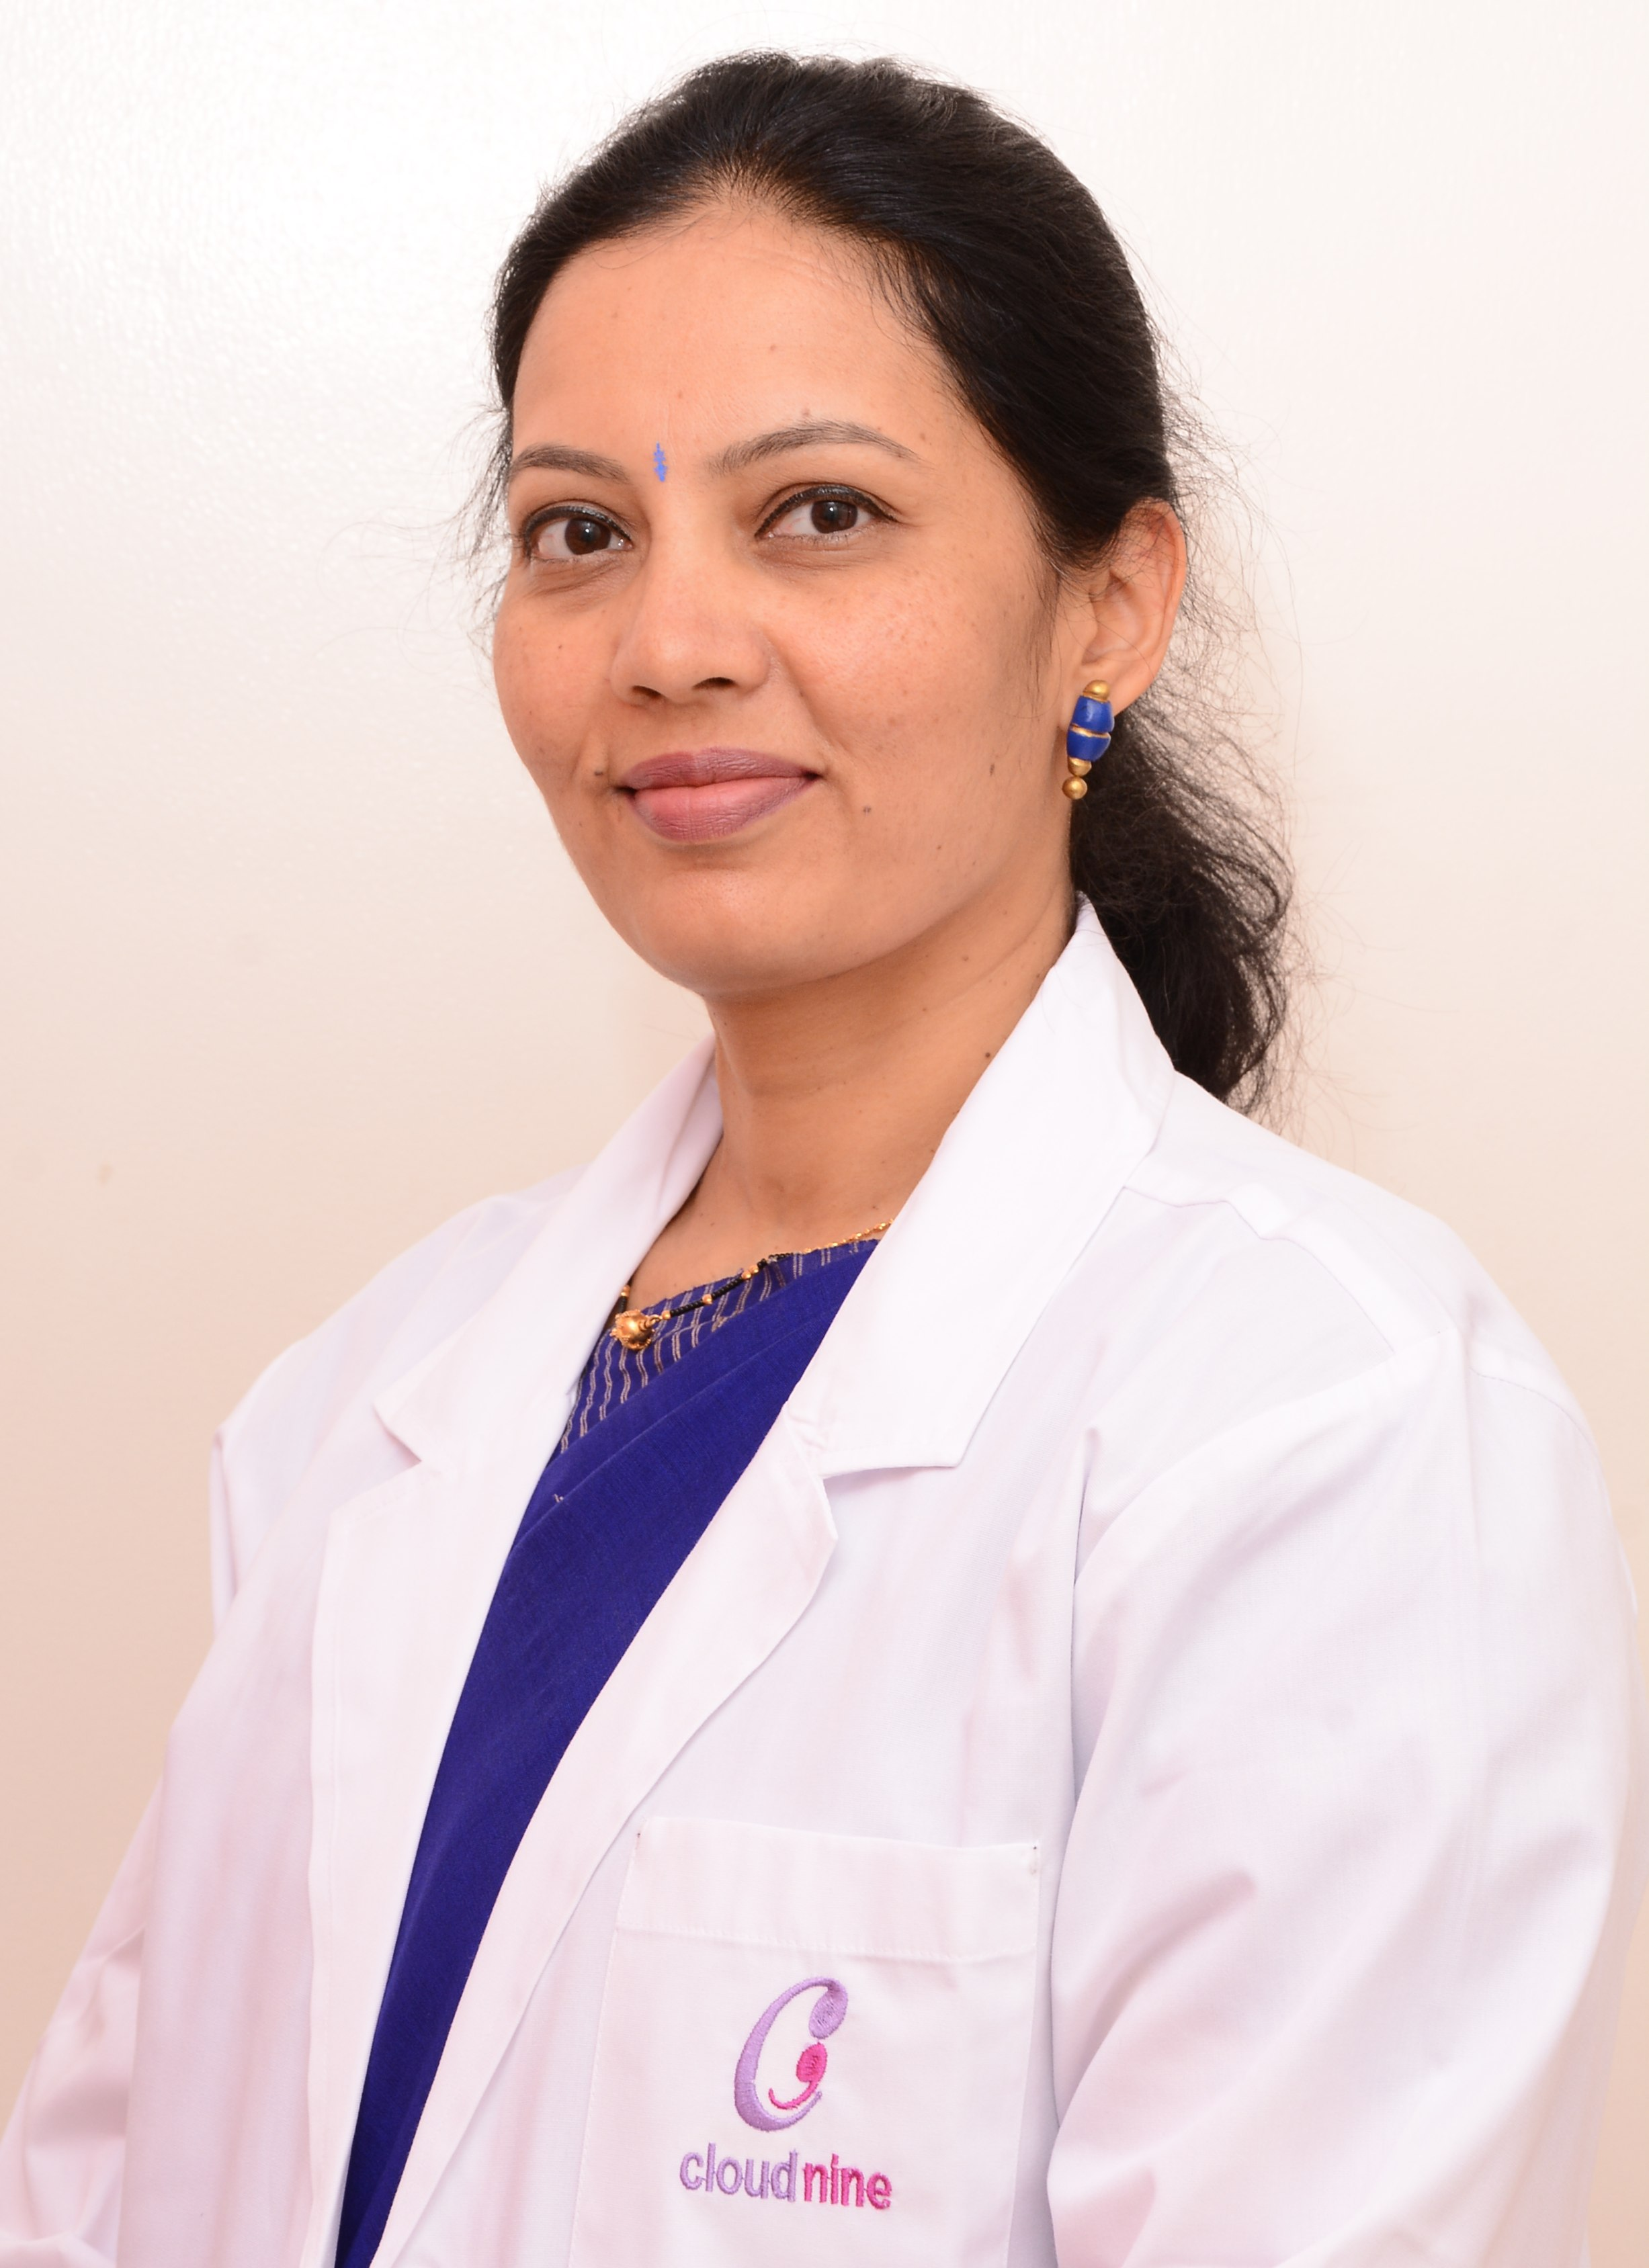 Dr. Nandini Nagar